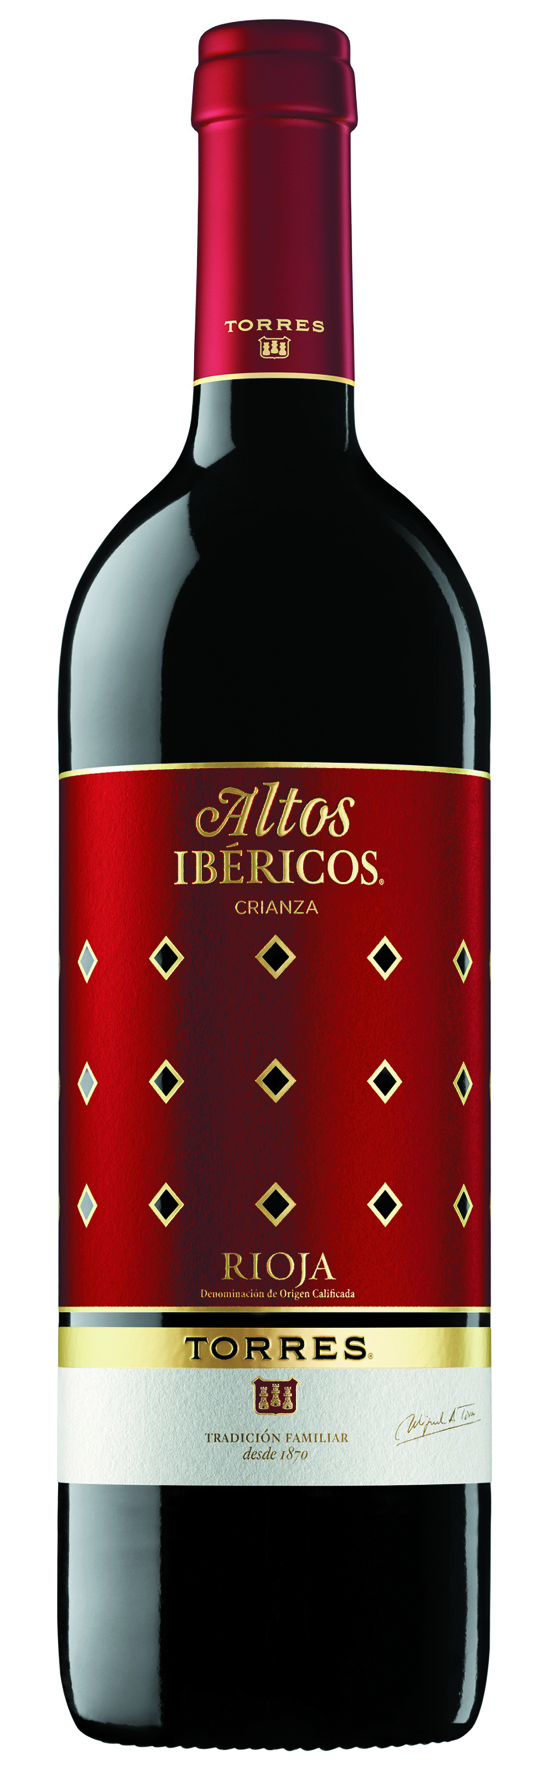 2014 Altos Ibericos Crianza Miguel Torres DOCa Rioja